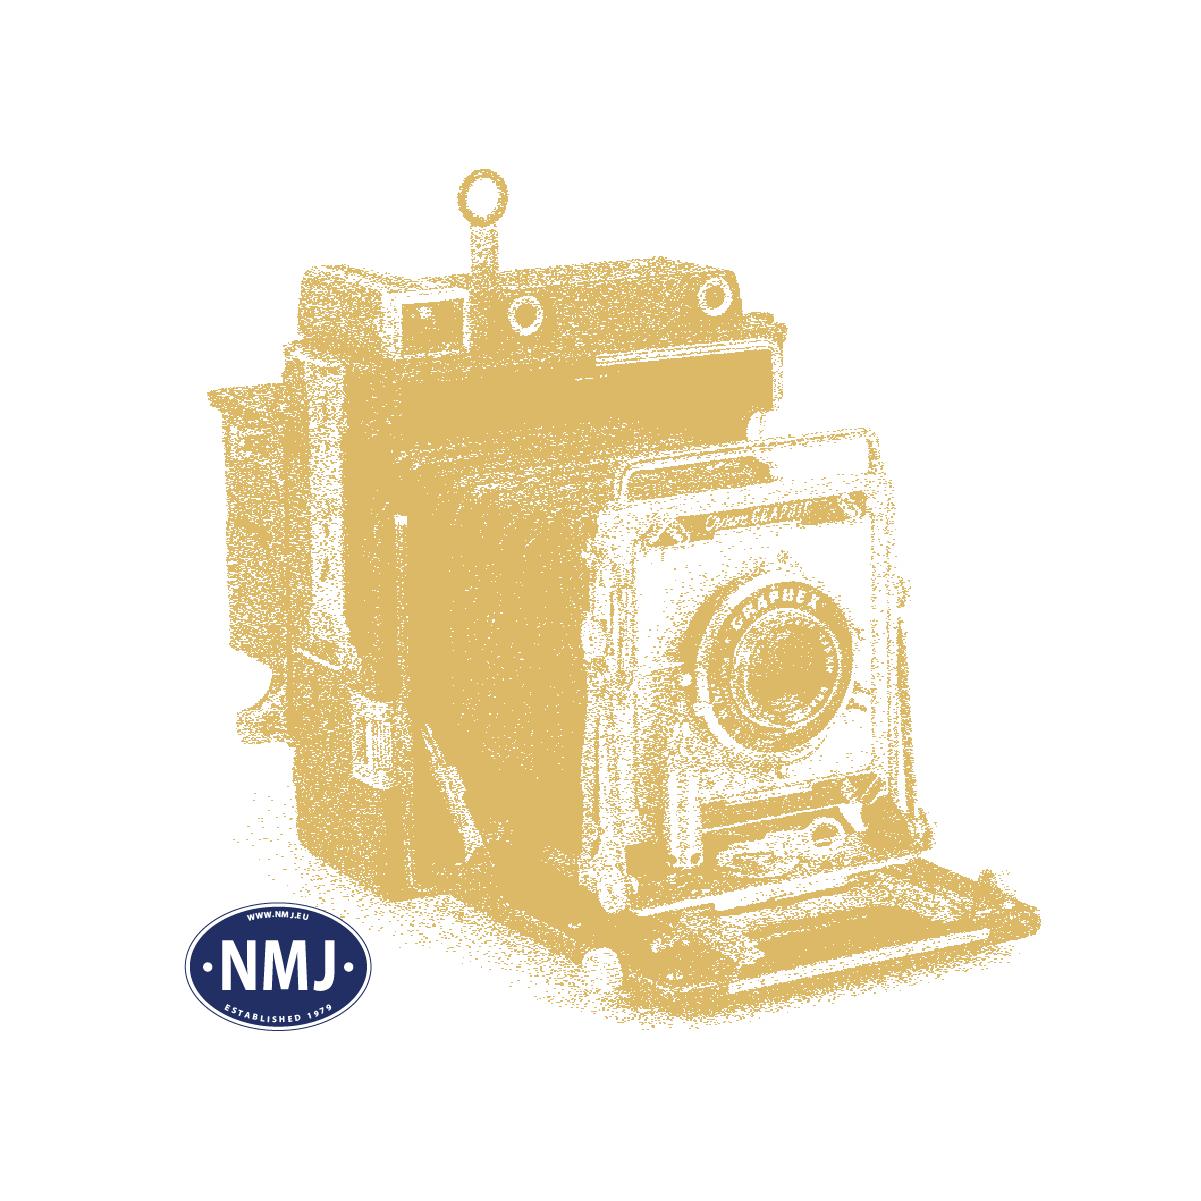 "NMJT609.304 - NMJ Topline SJ Gre 53085 ""Gullfiber"""